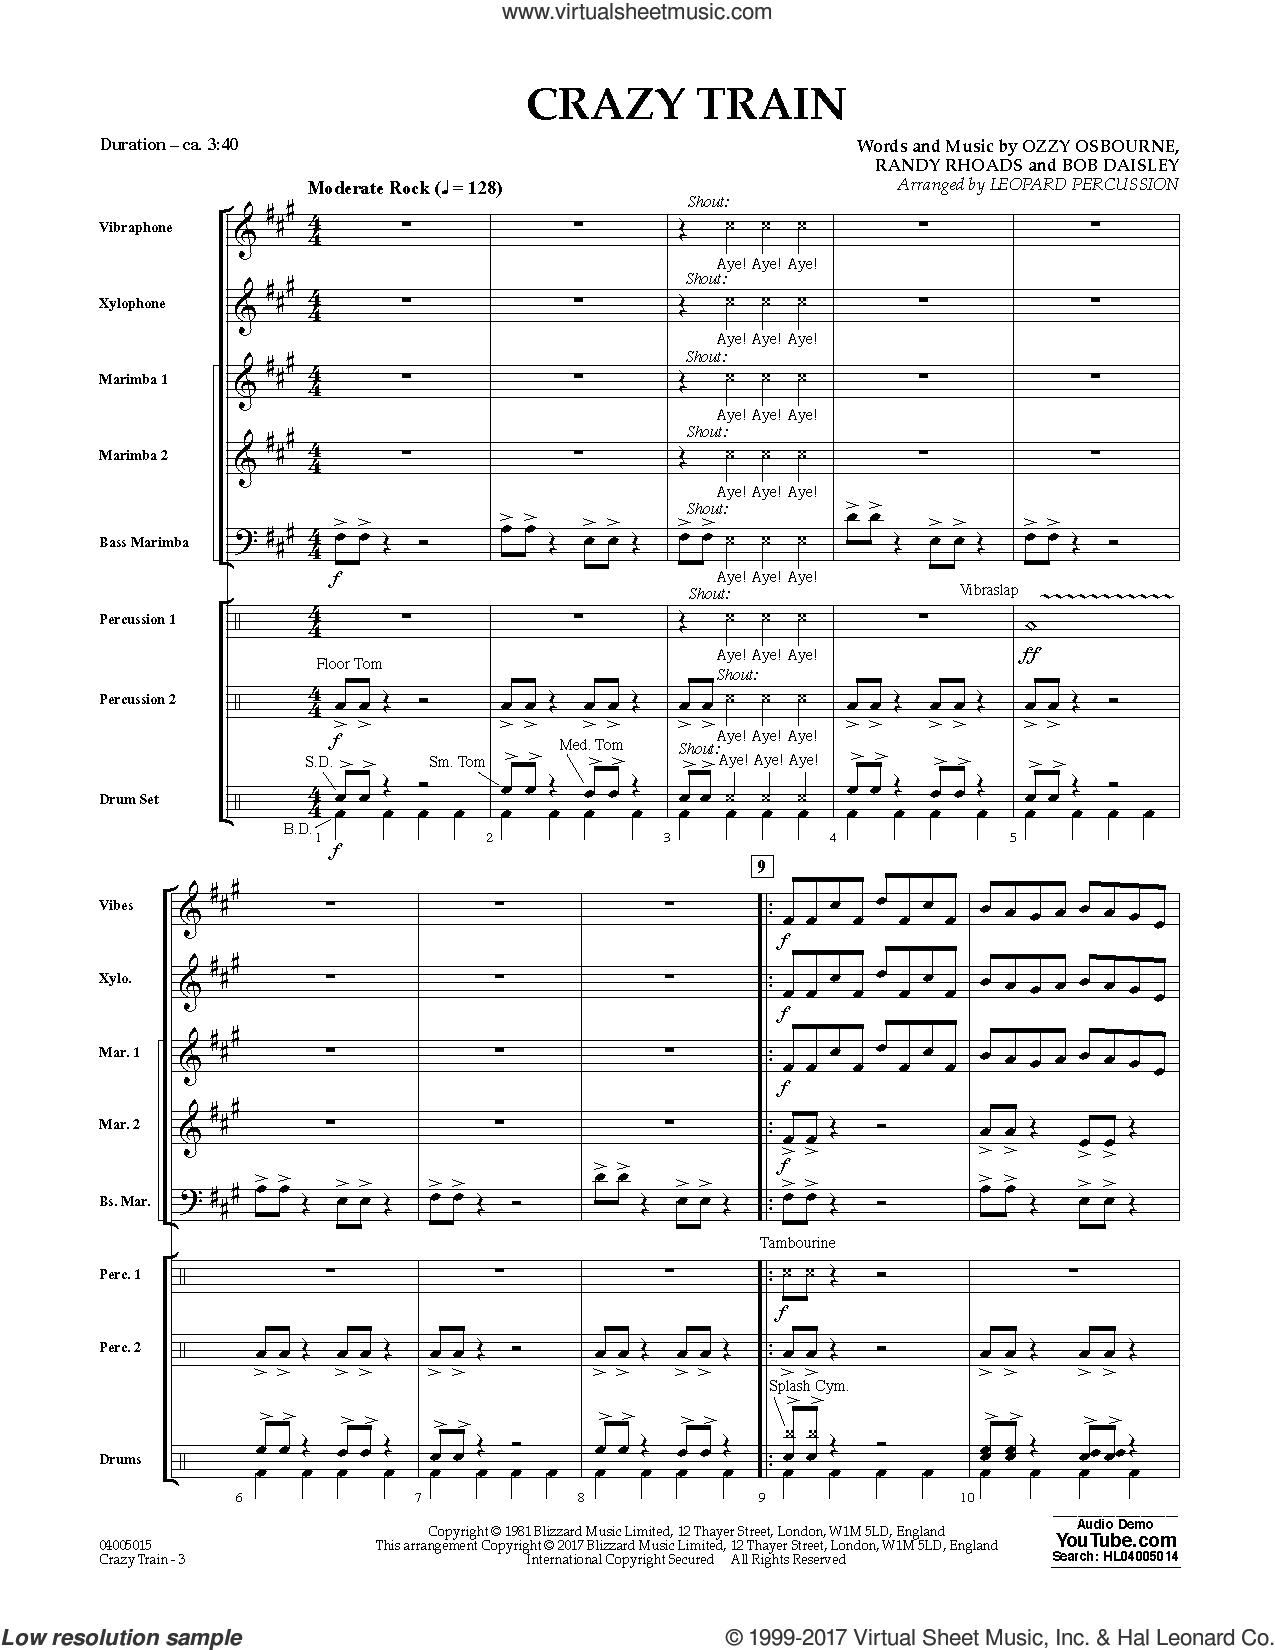 Crazy Train (COMPLETE) sheet music for concert band by Ozzy Osbourne, Black Sabbath, Bob Daisley, Diane Downs and Randy Rhoads, intermediate skill level